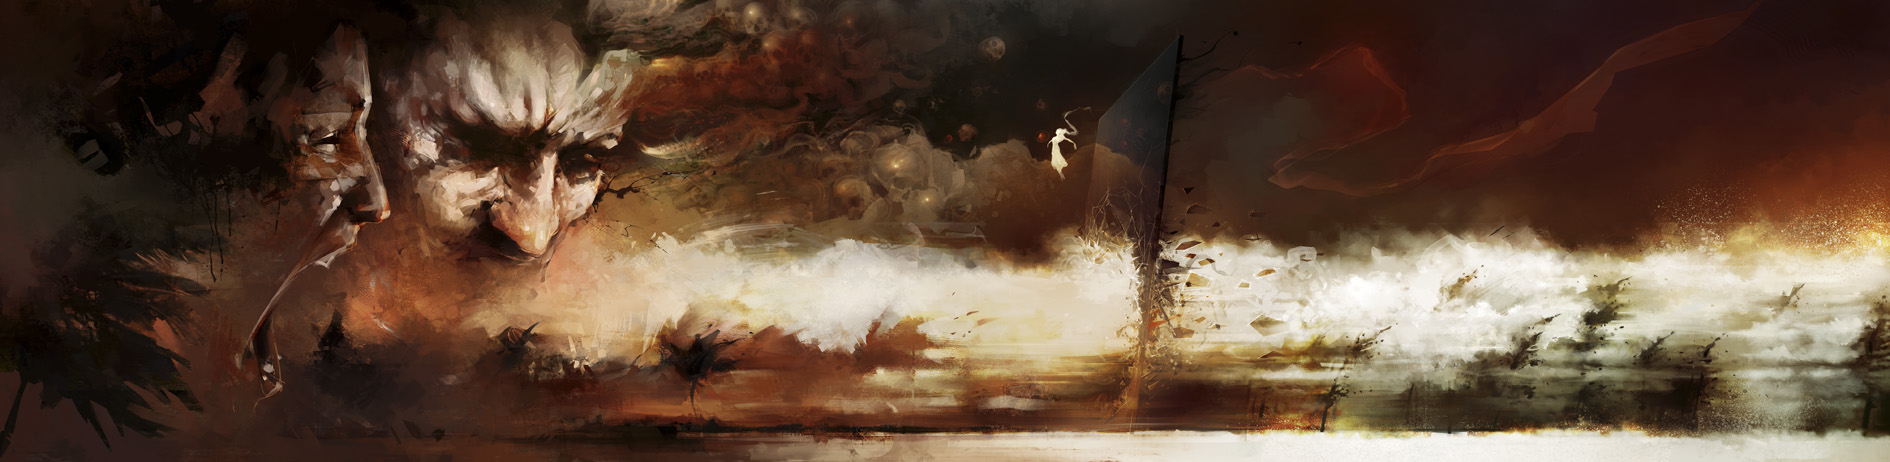 Angel Diavolo from Saga of Siddharta